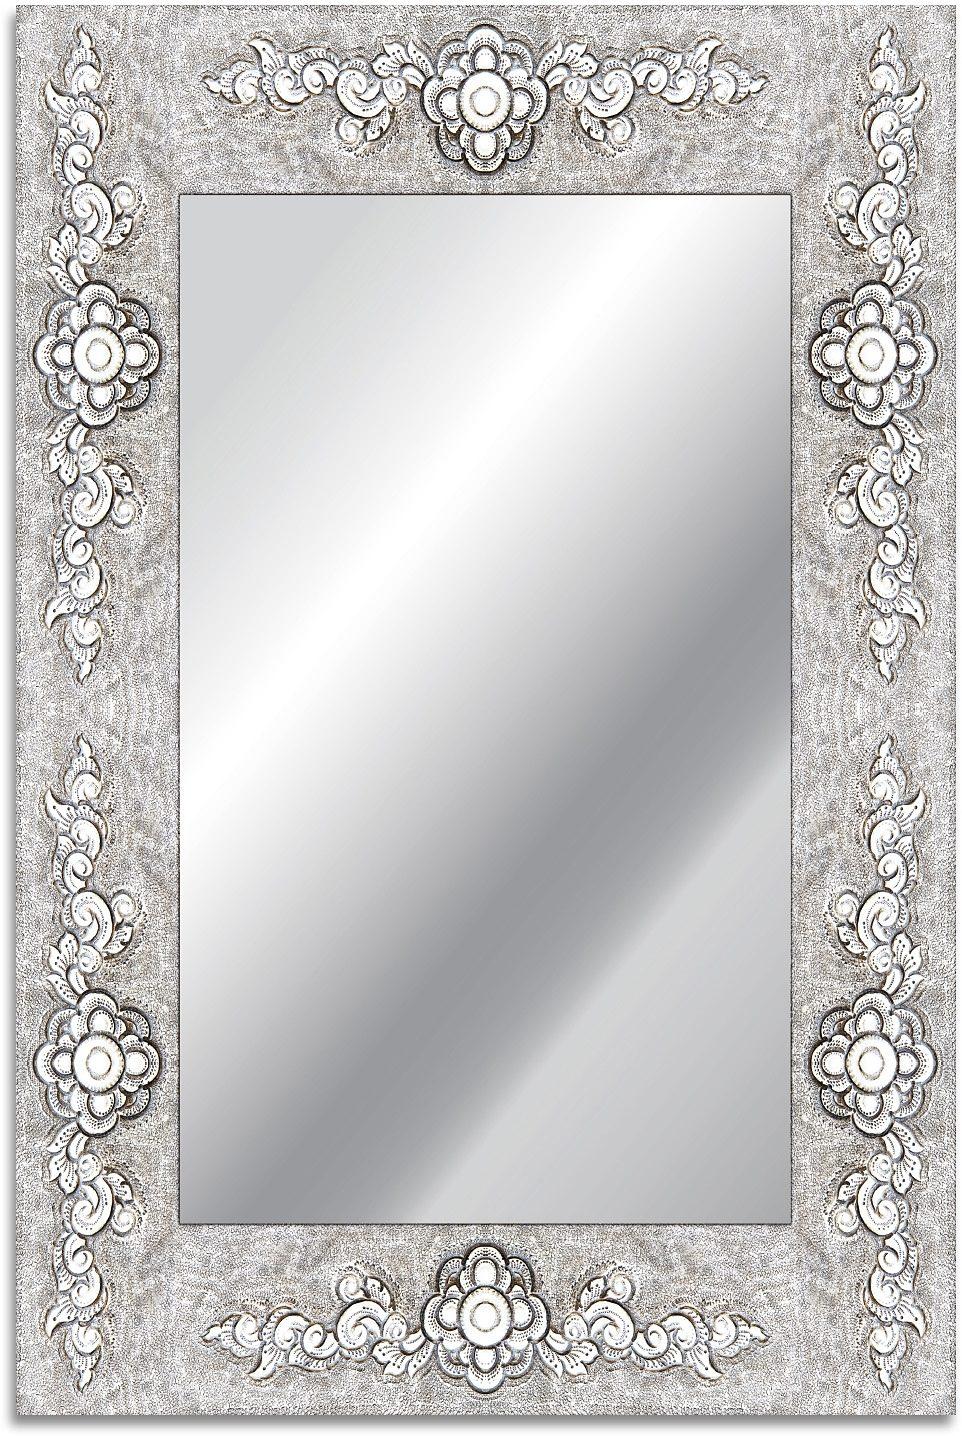 Home affaire, Spiegel, »Rahmen Blume«, 40/60 cm